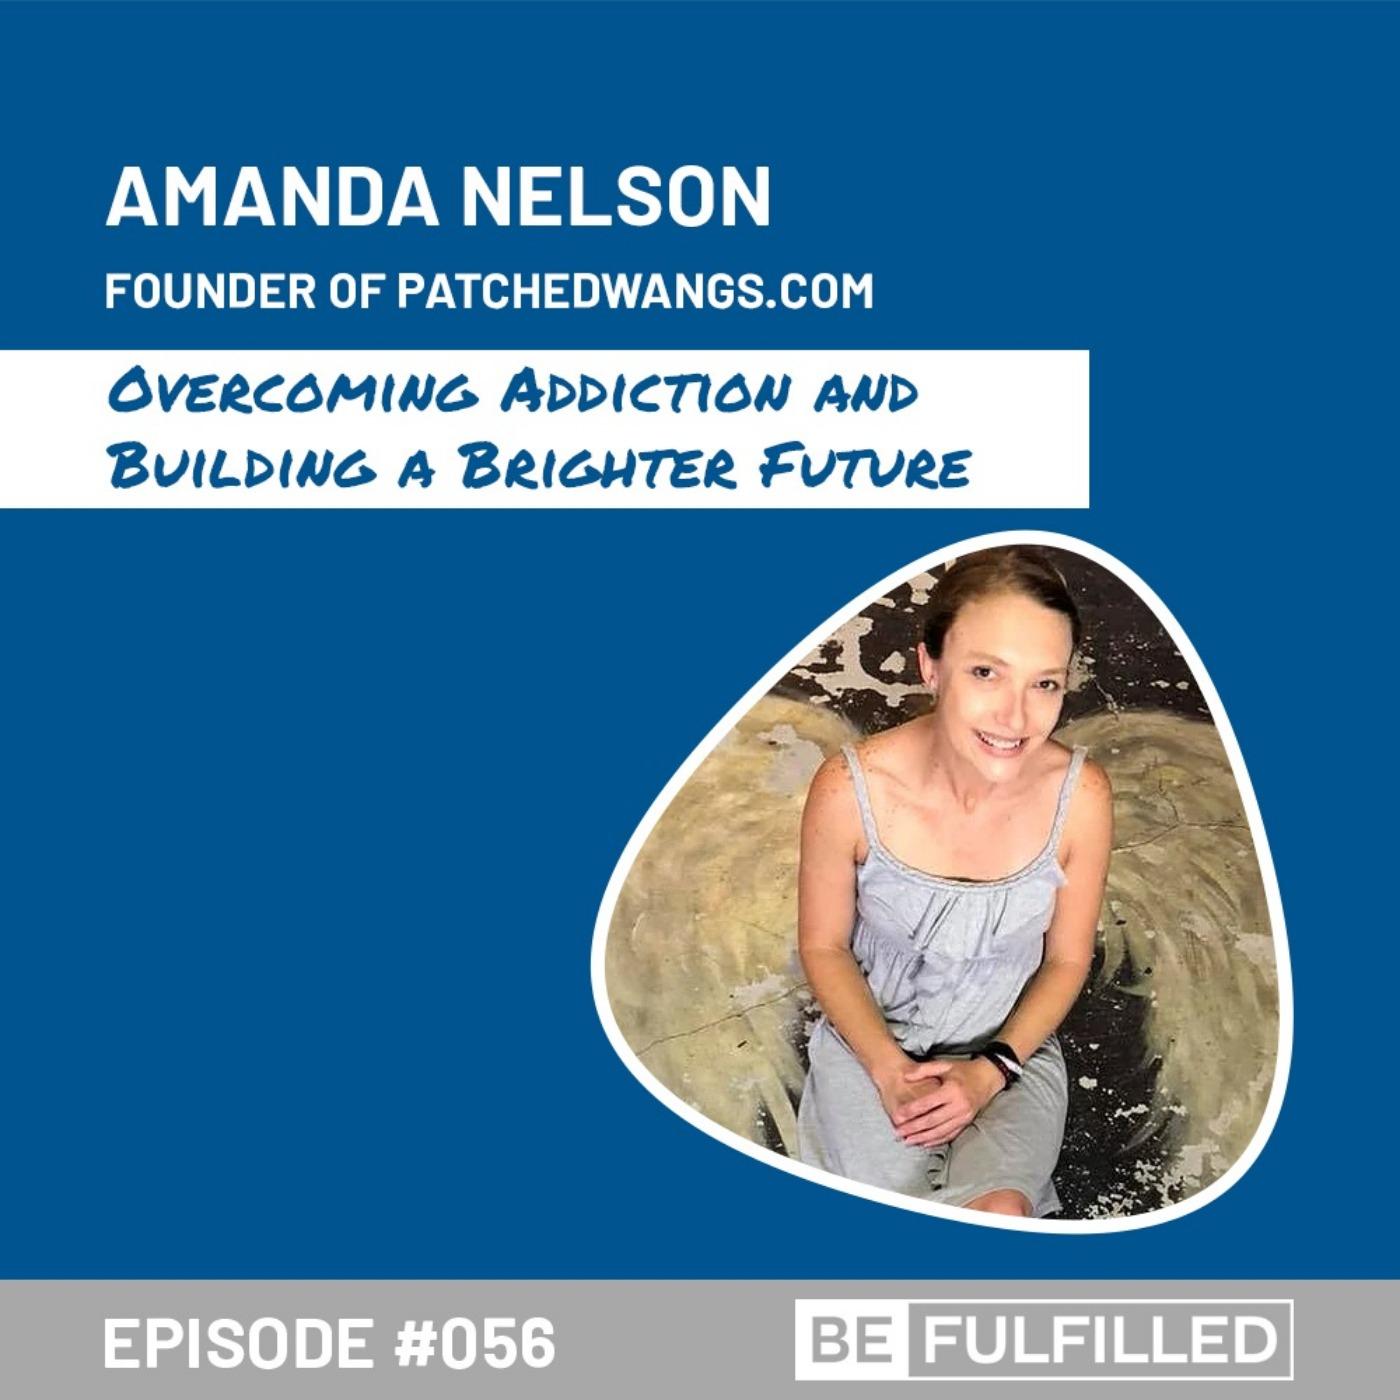 Overcoming Addiction and Building a Brighter Future - Amanda Nelson